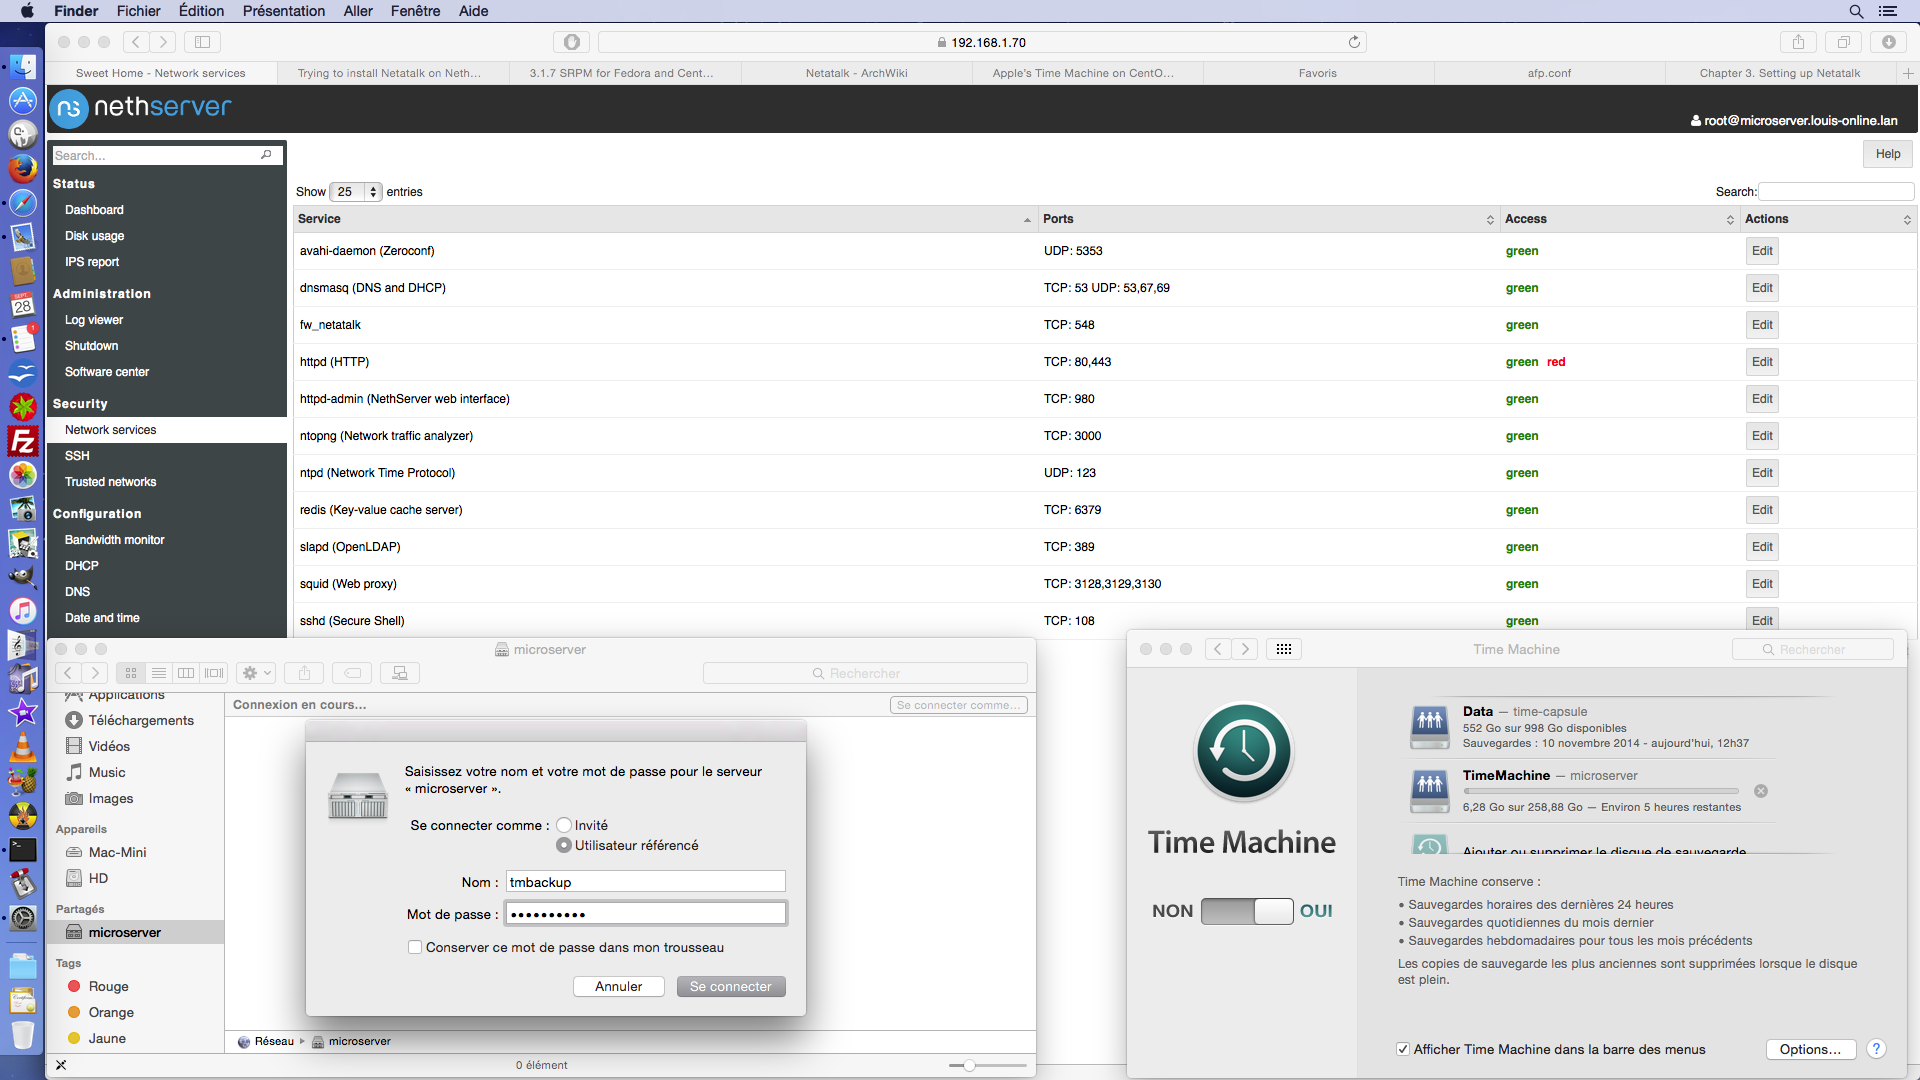 Trying to install Netatalk on NethServer - Development - NethServer